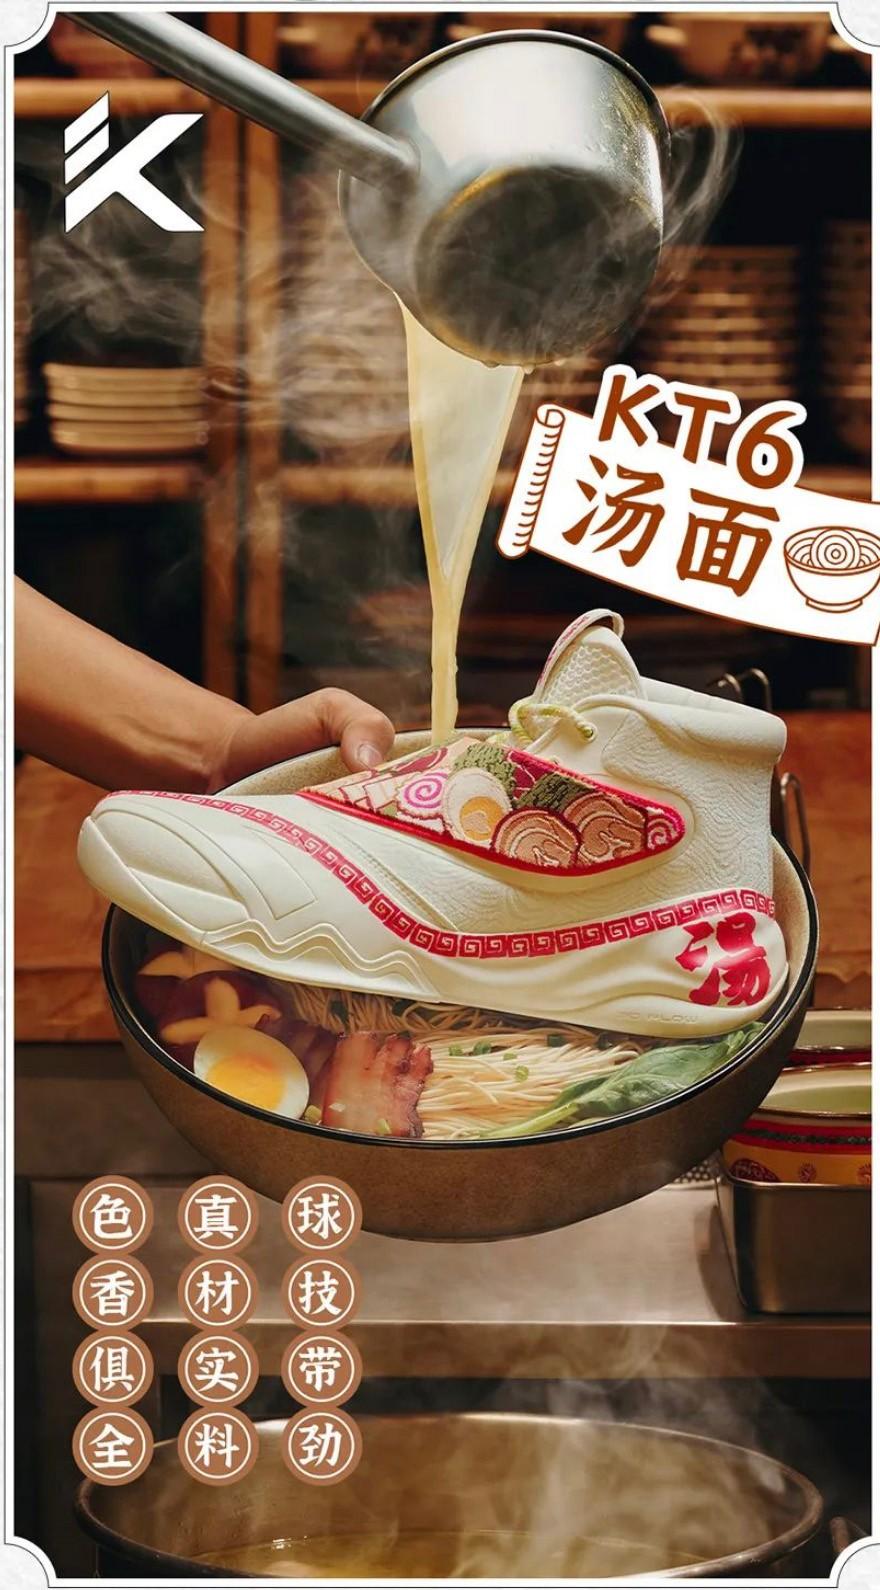 anta,安踏,KT6,GH2  直接给我看饿了!本月最「让人眼馋」的限定球鞋刚刚发售!